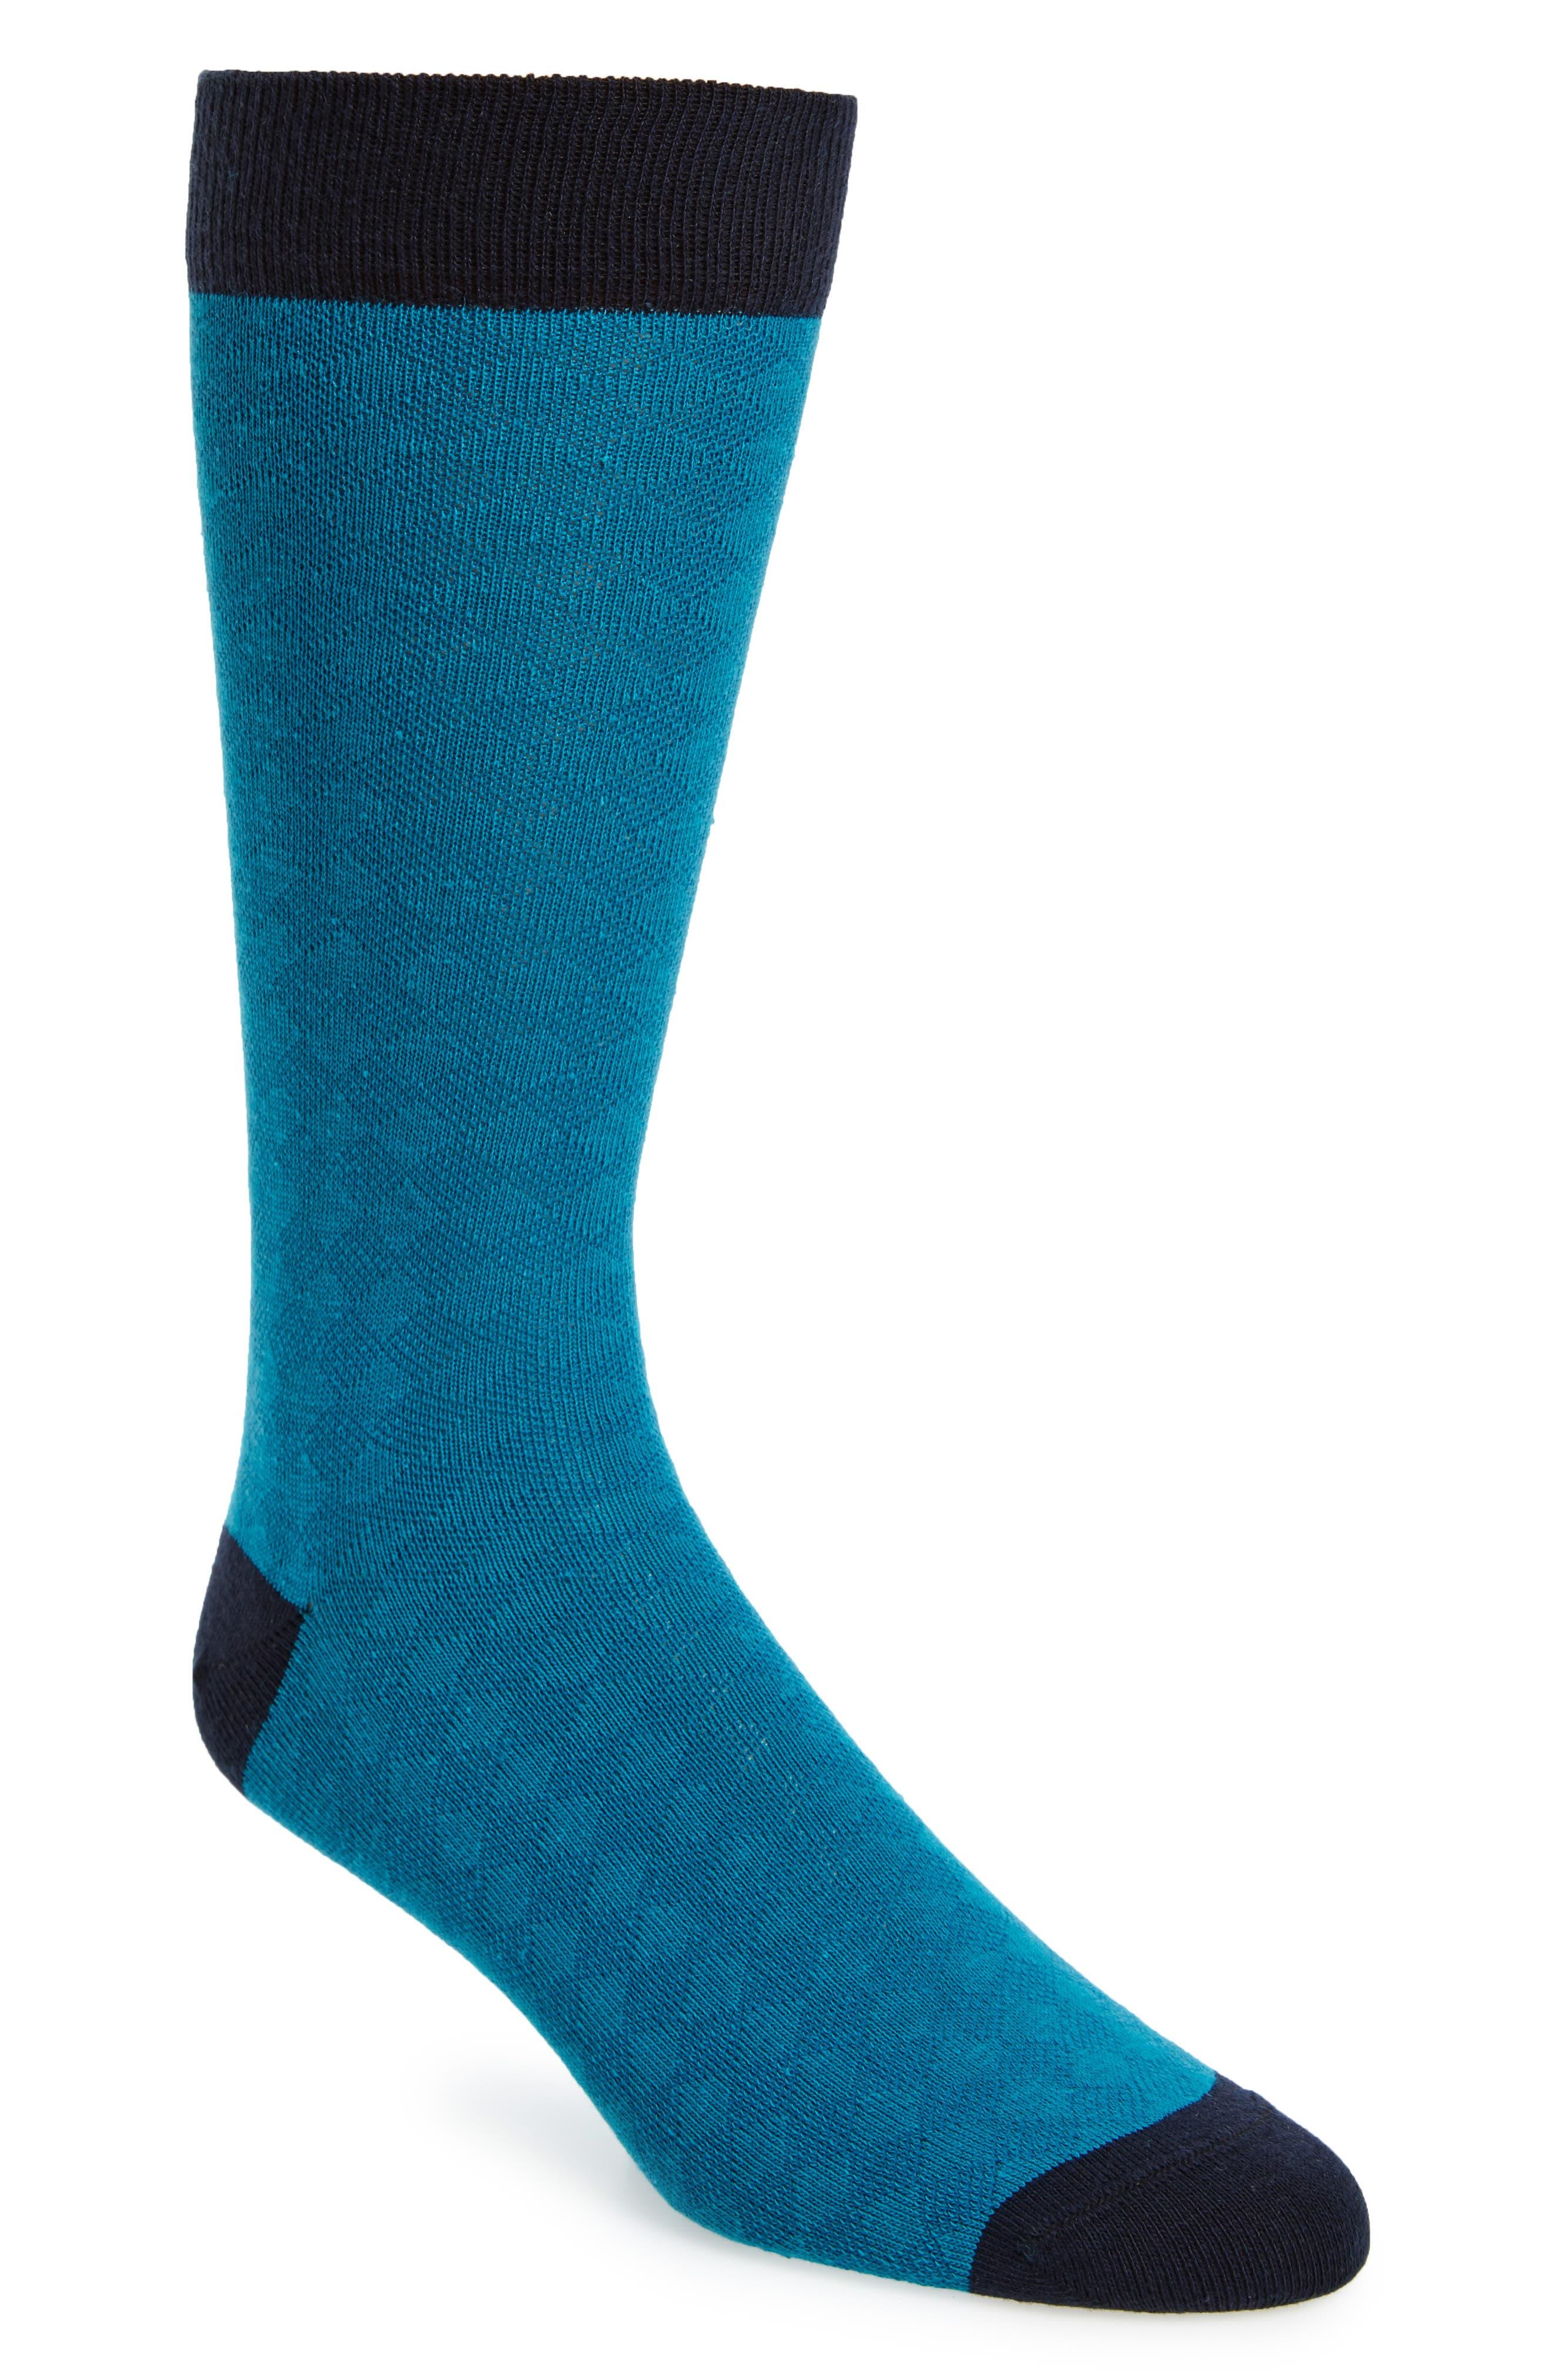 Oakwood Geometric Socks,                             Main thumbnail 1, color,                             Teal